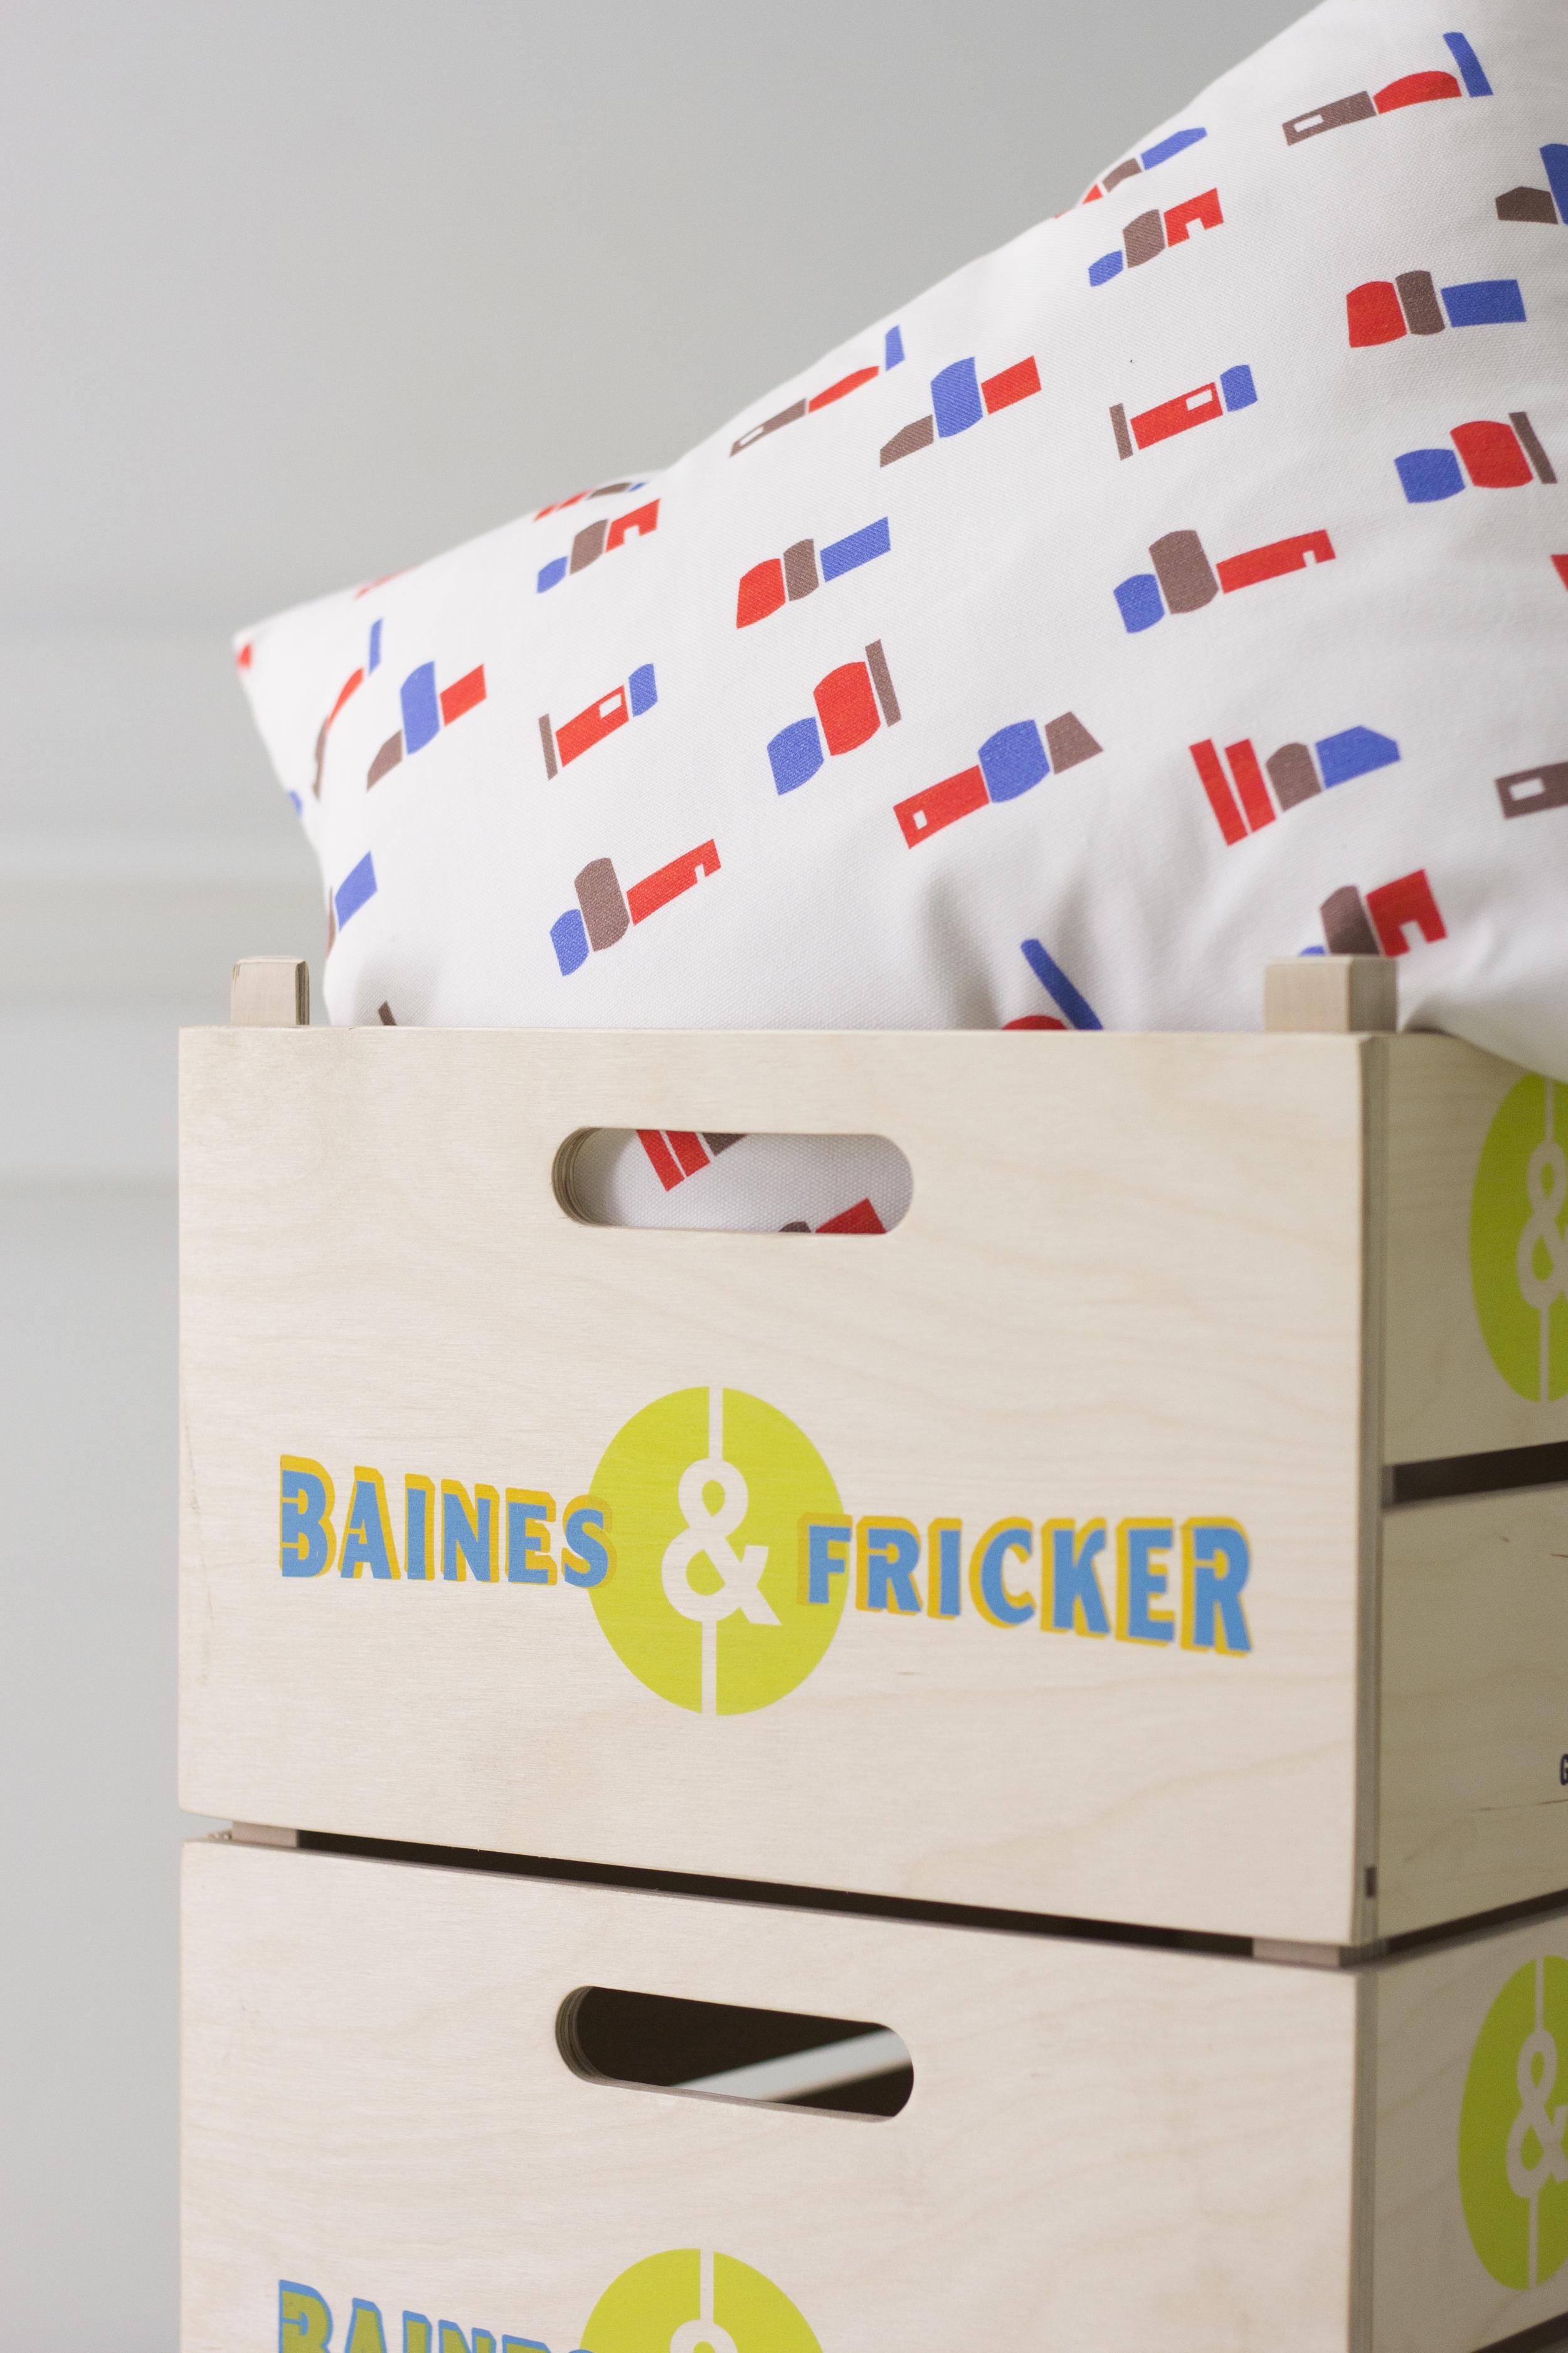 Baines & Fricker